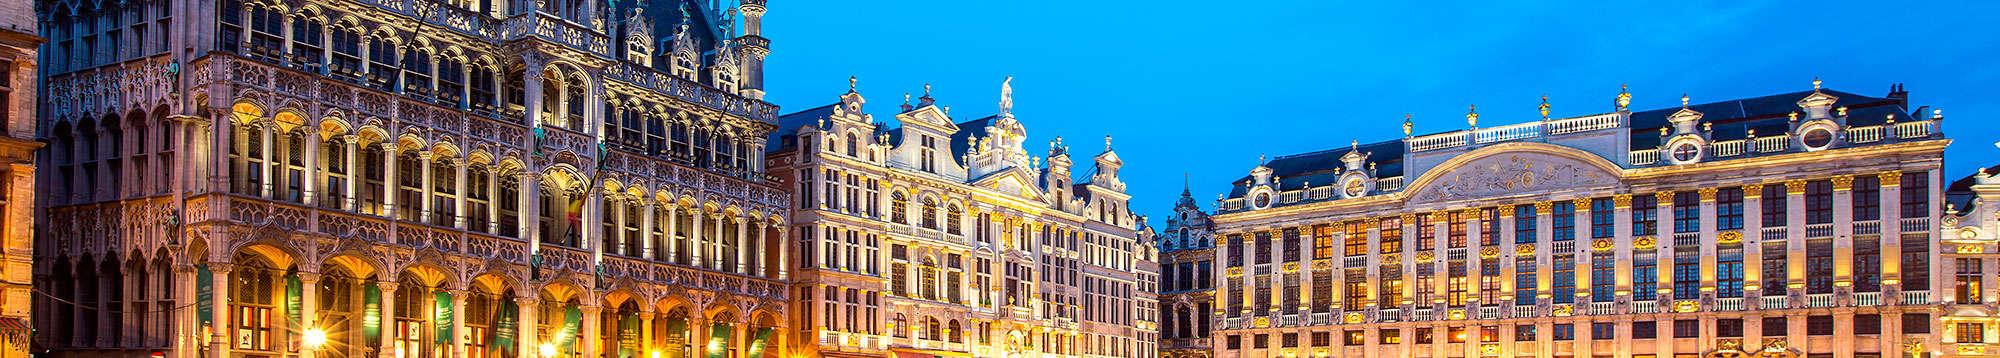 Week end e soggiorni Bruxelles